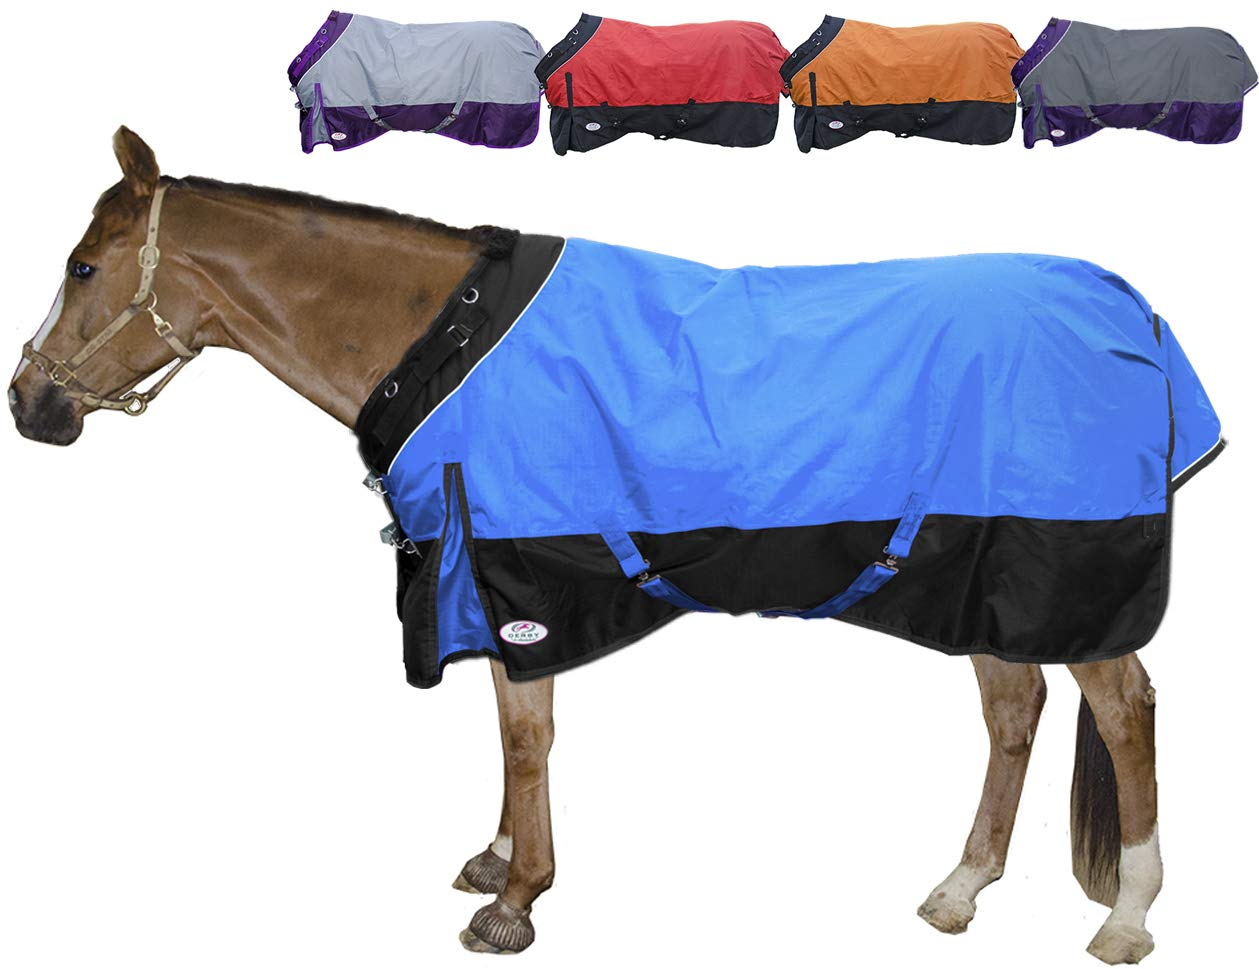 Derby Originals 80-8037-RBL-72 Windstorm Series Reflective Safety 1200D Ripstop Waterproof Nylon Horse Winter Turnout Blanket, Electric Blue/Black, 72'' by Derby Originals